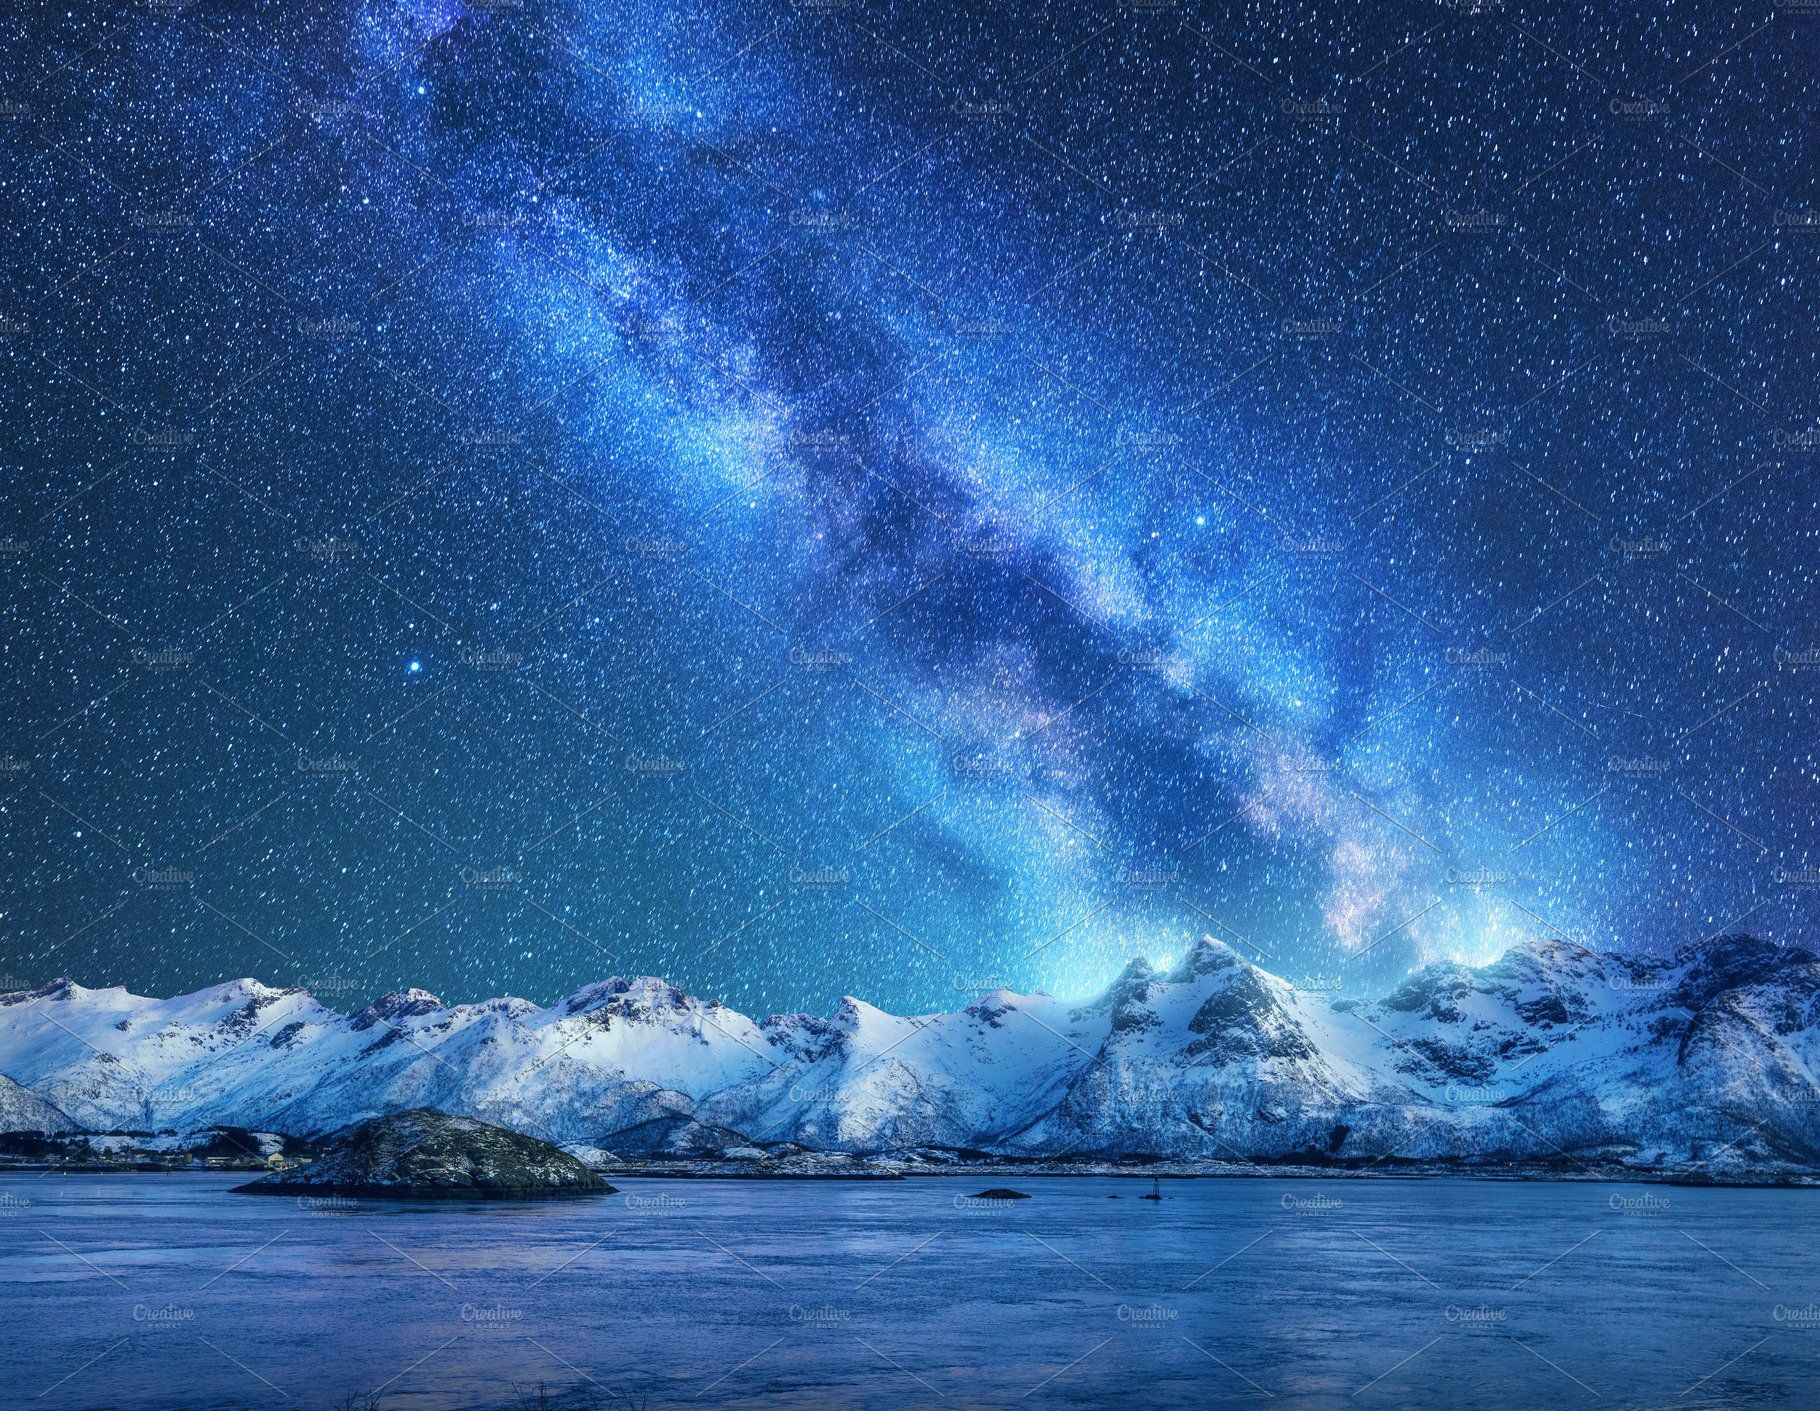 Bright Milky Way Over Snowy Rocks Night Landscape Mountain Landscape Night Photos